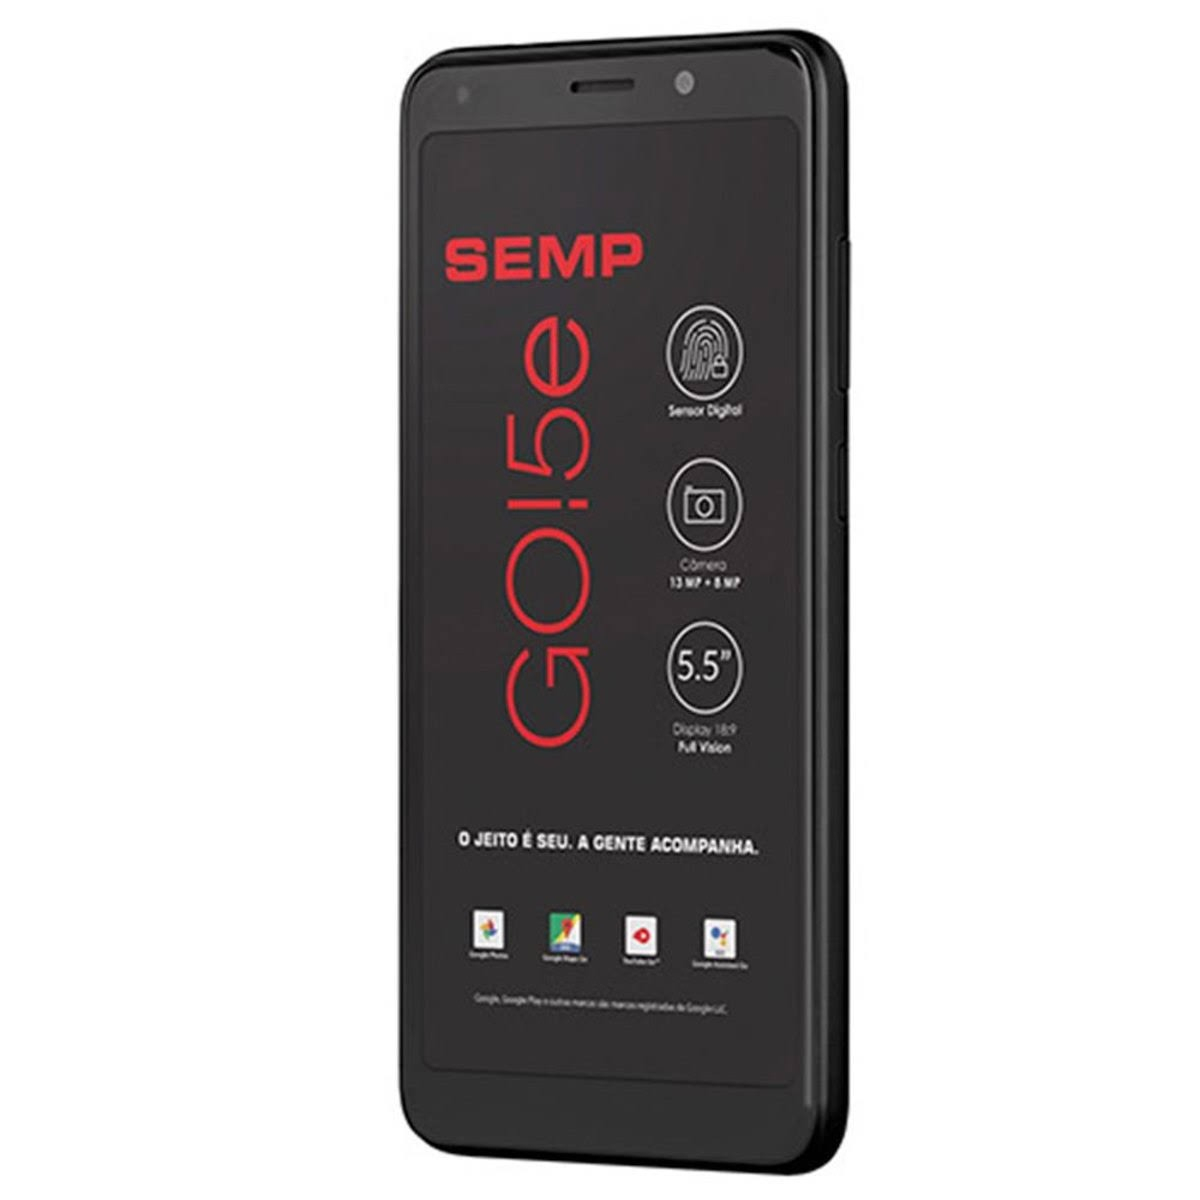 "Smartphone SEMP GO! 5e, Preto, Tela de 5.5"", 16GB, 13MP"